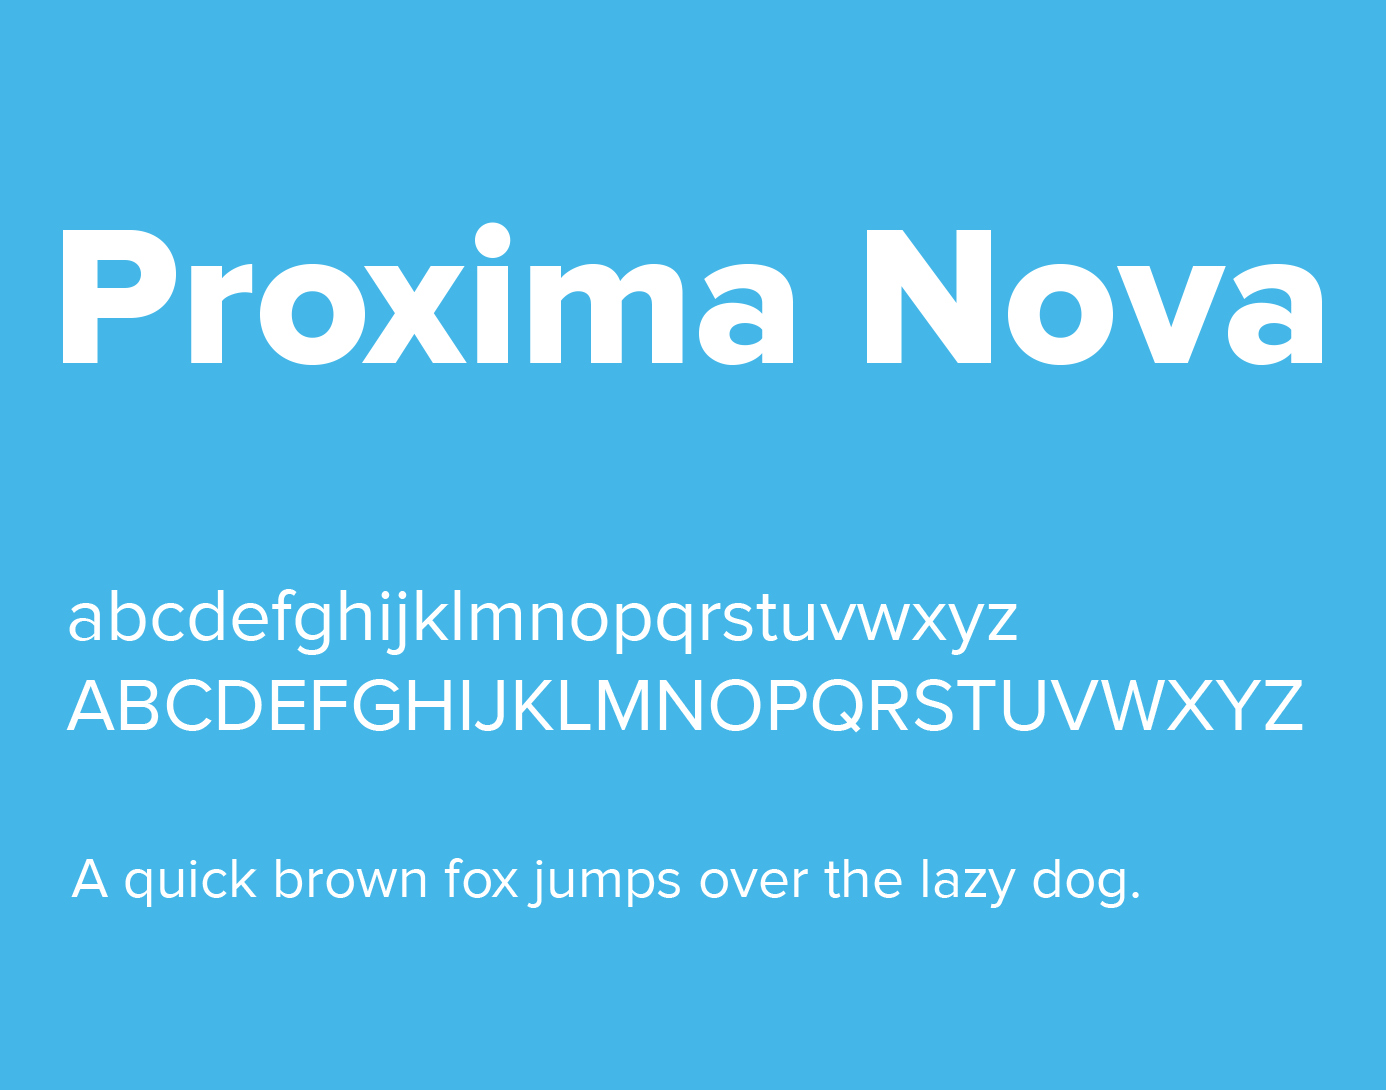 proxima-nova-typeface